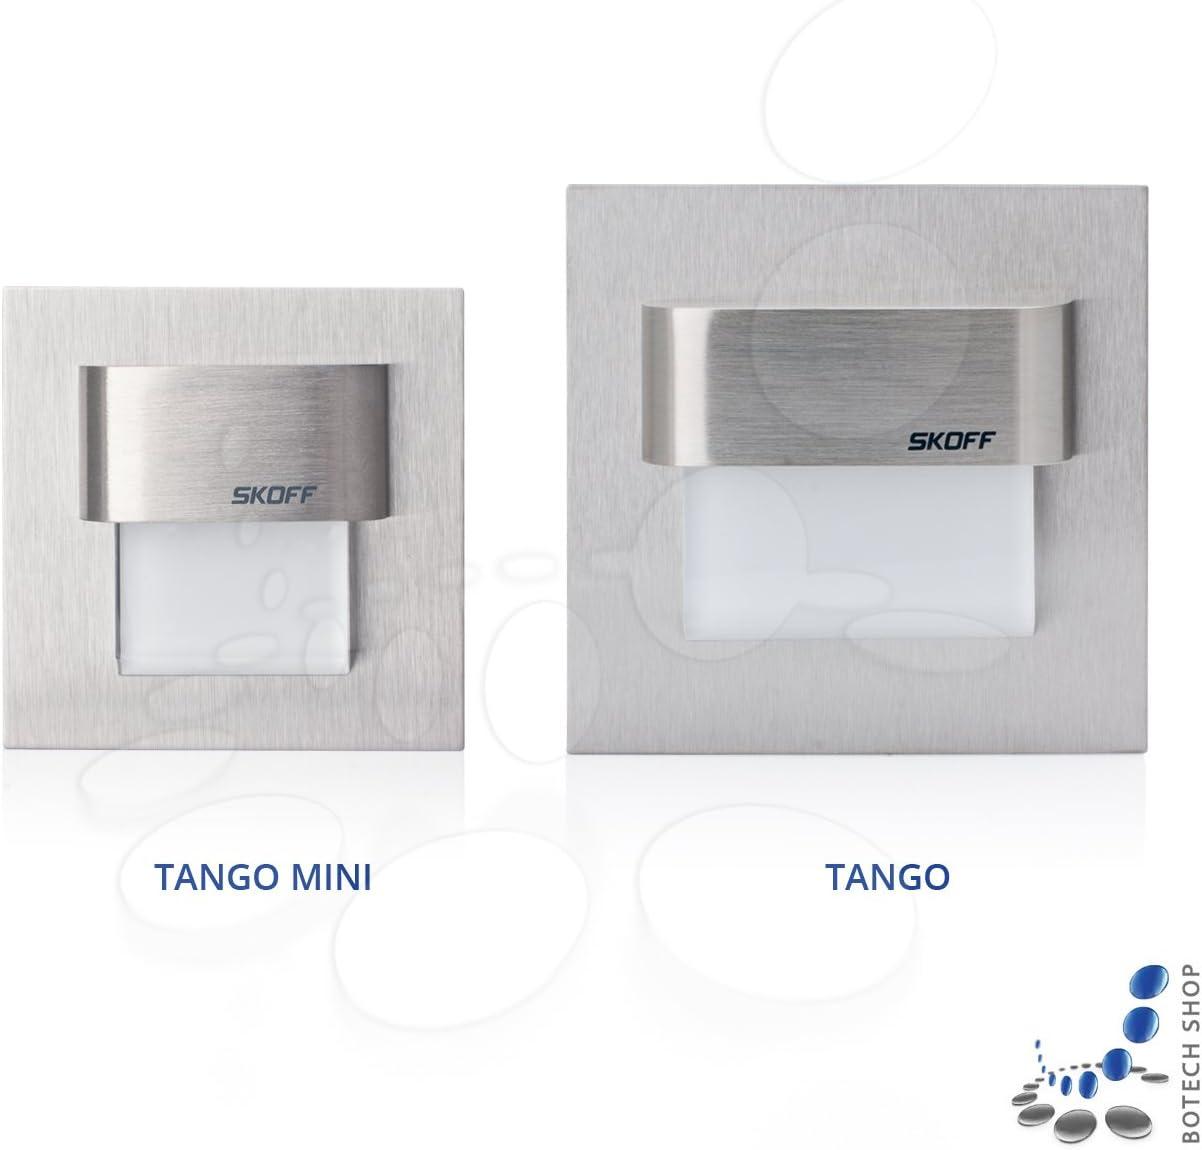 SKOFF LED Einbauleuchte Tango mini ML TMI K W 9 DE 9 09 ...